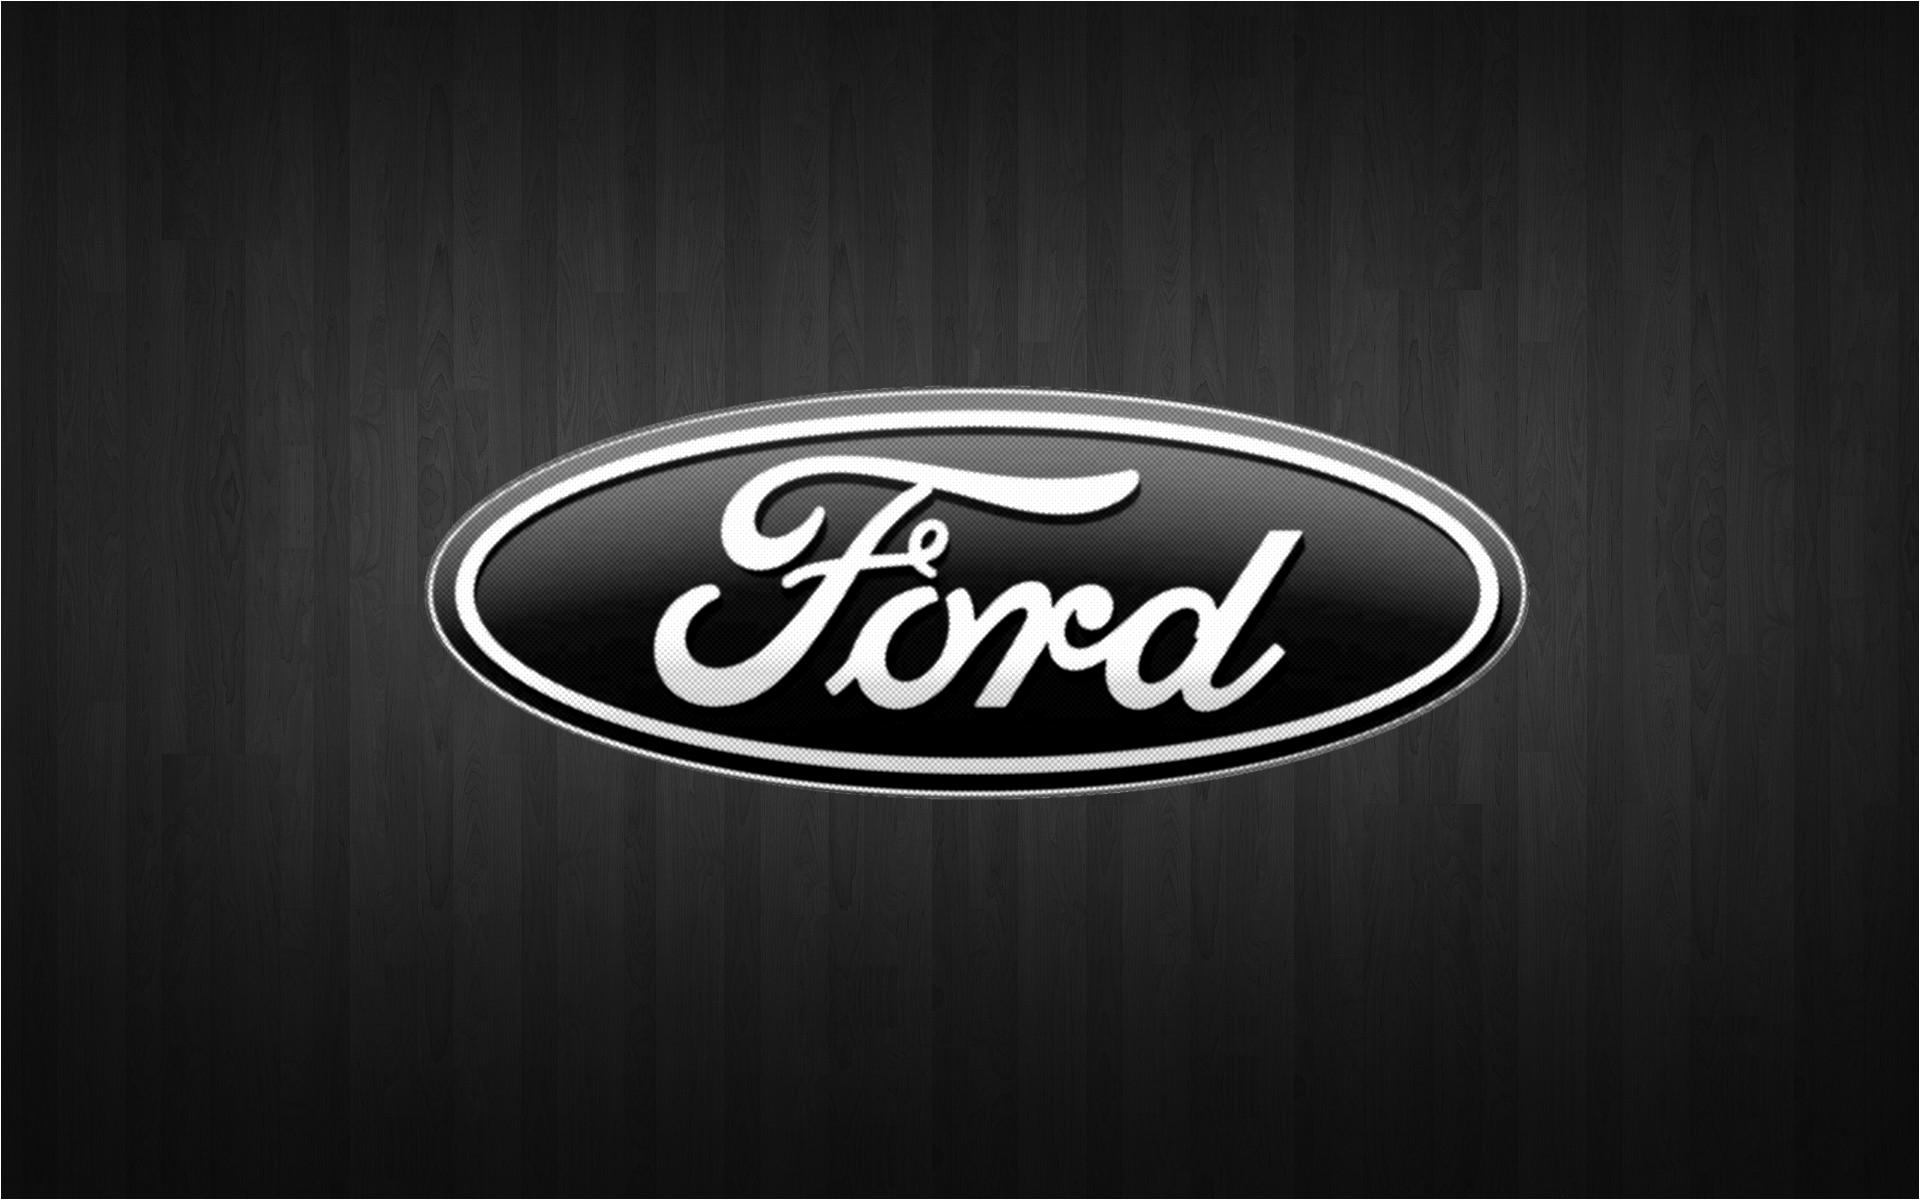 Ford Wallpaper 806306 Ford Wallpaper 806326 Ford Wallpaper 806294 1920x1200